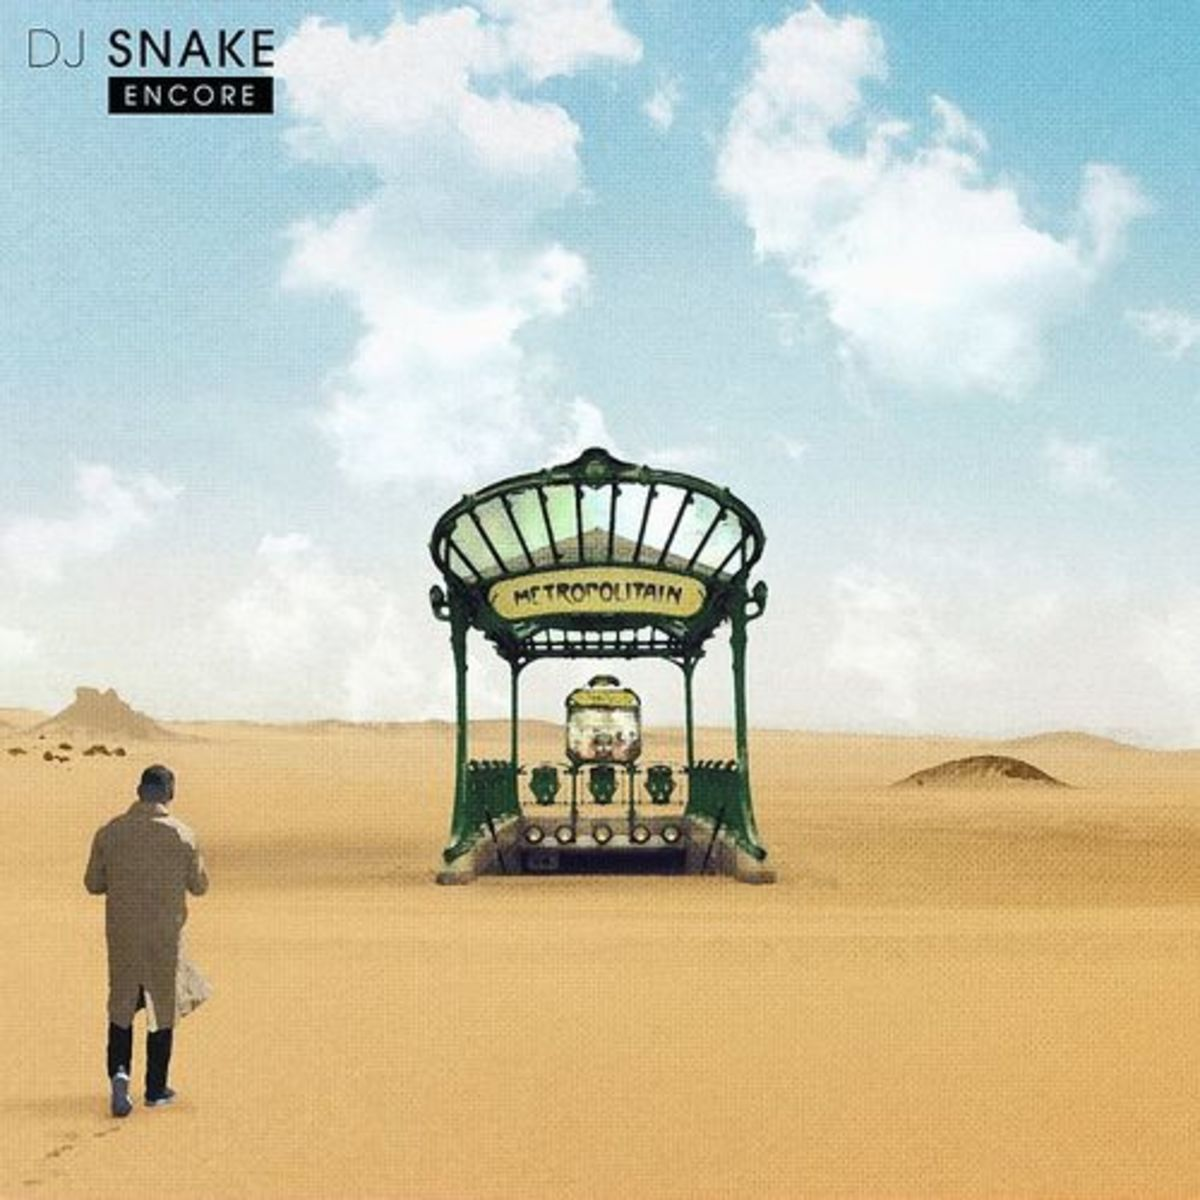 dj-snake-encore.jpg